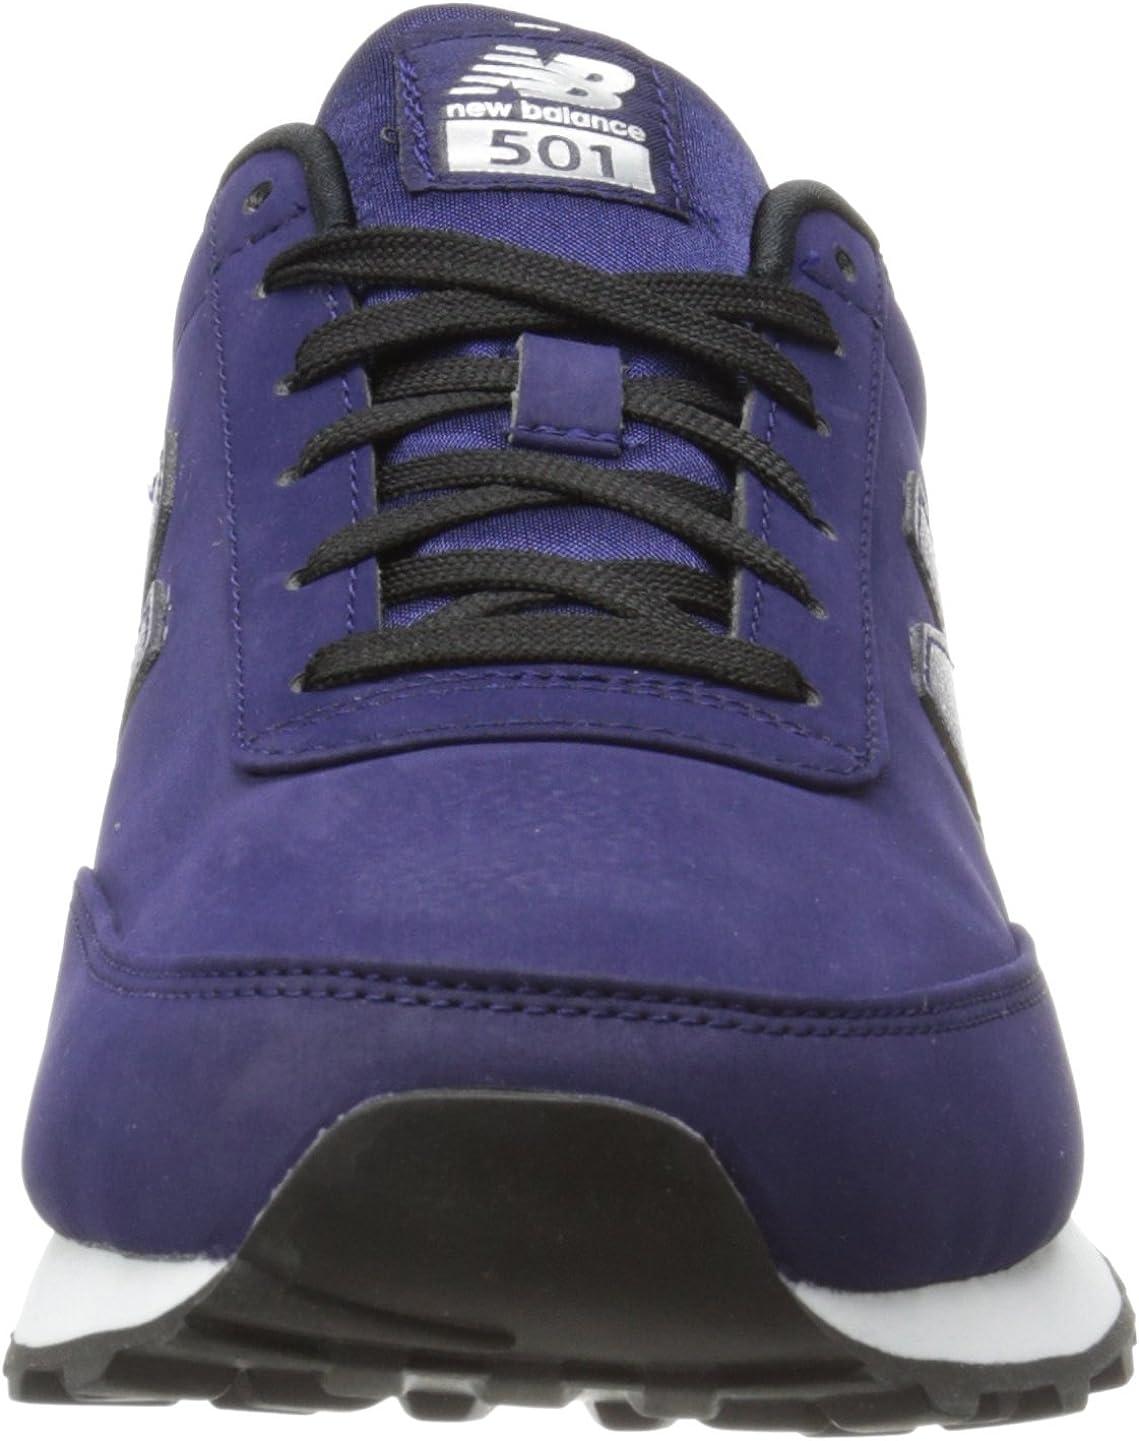 New Balance Men s ML501 High Roller Pack Fashion Sneaker